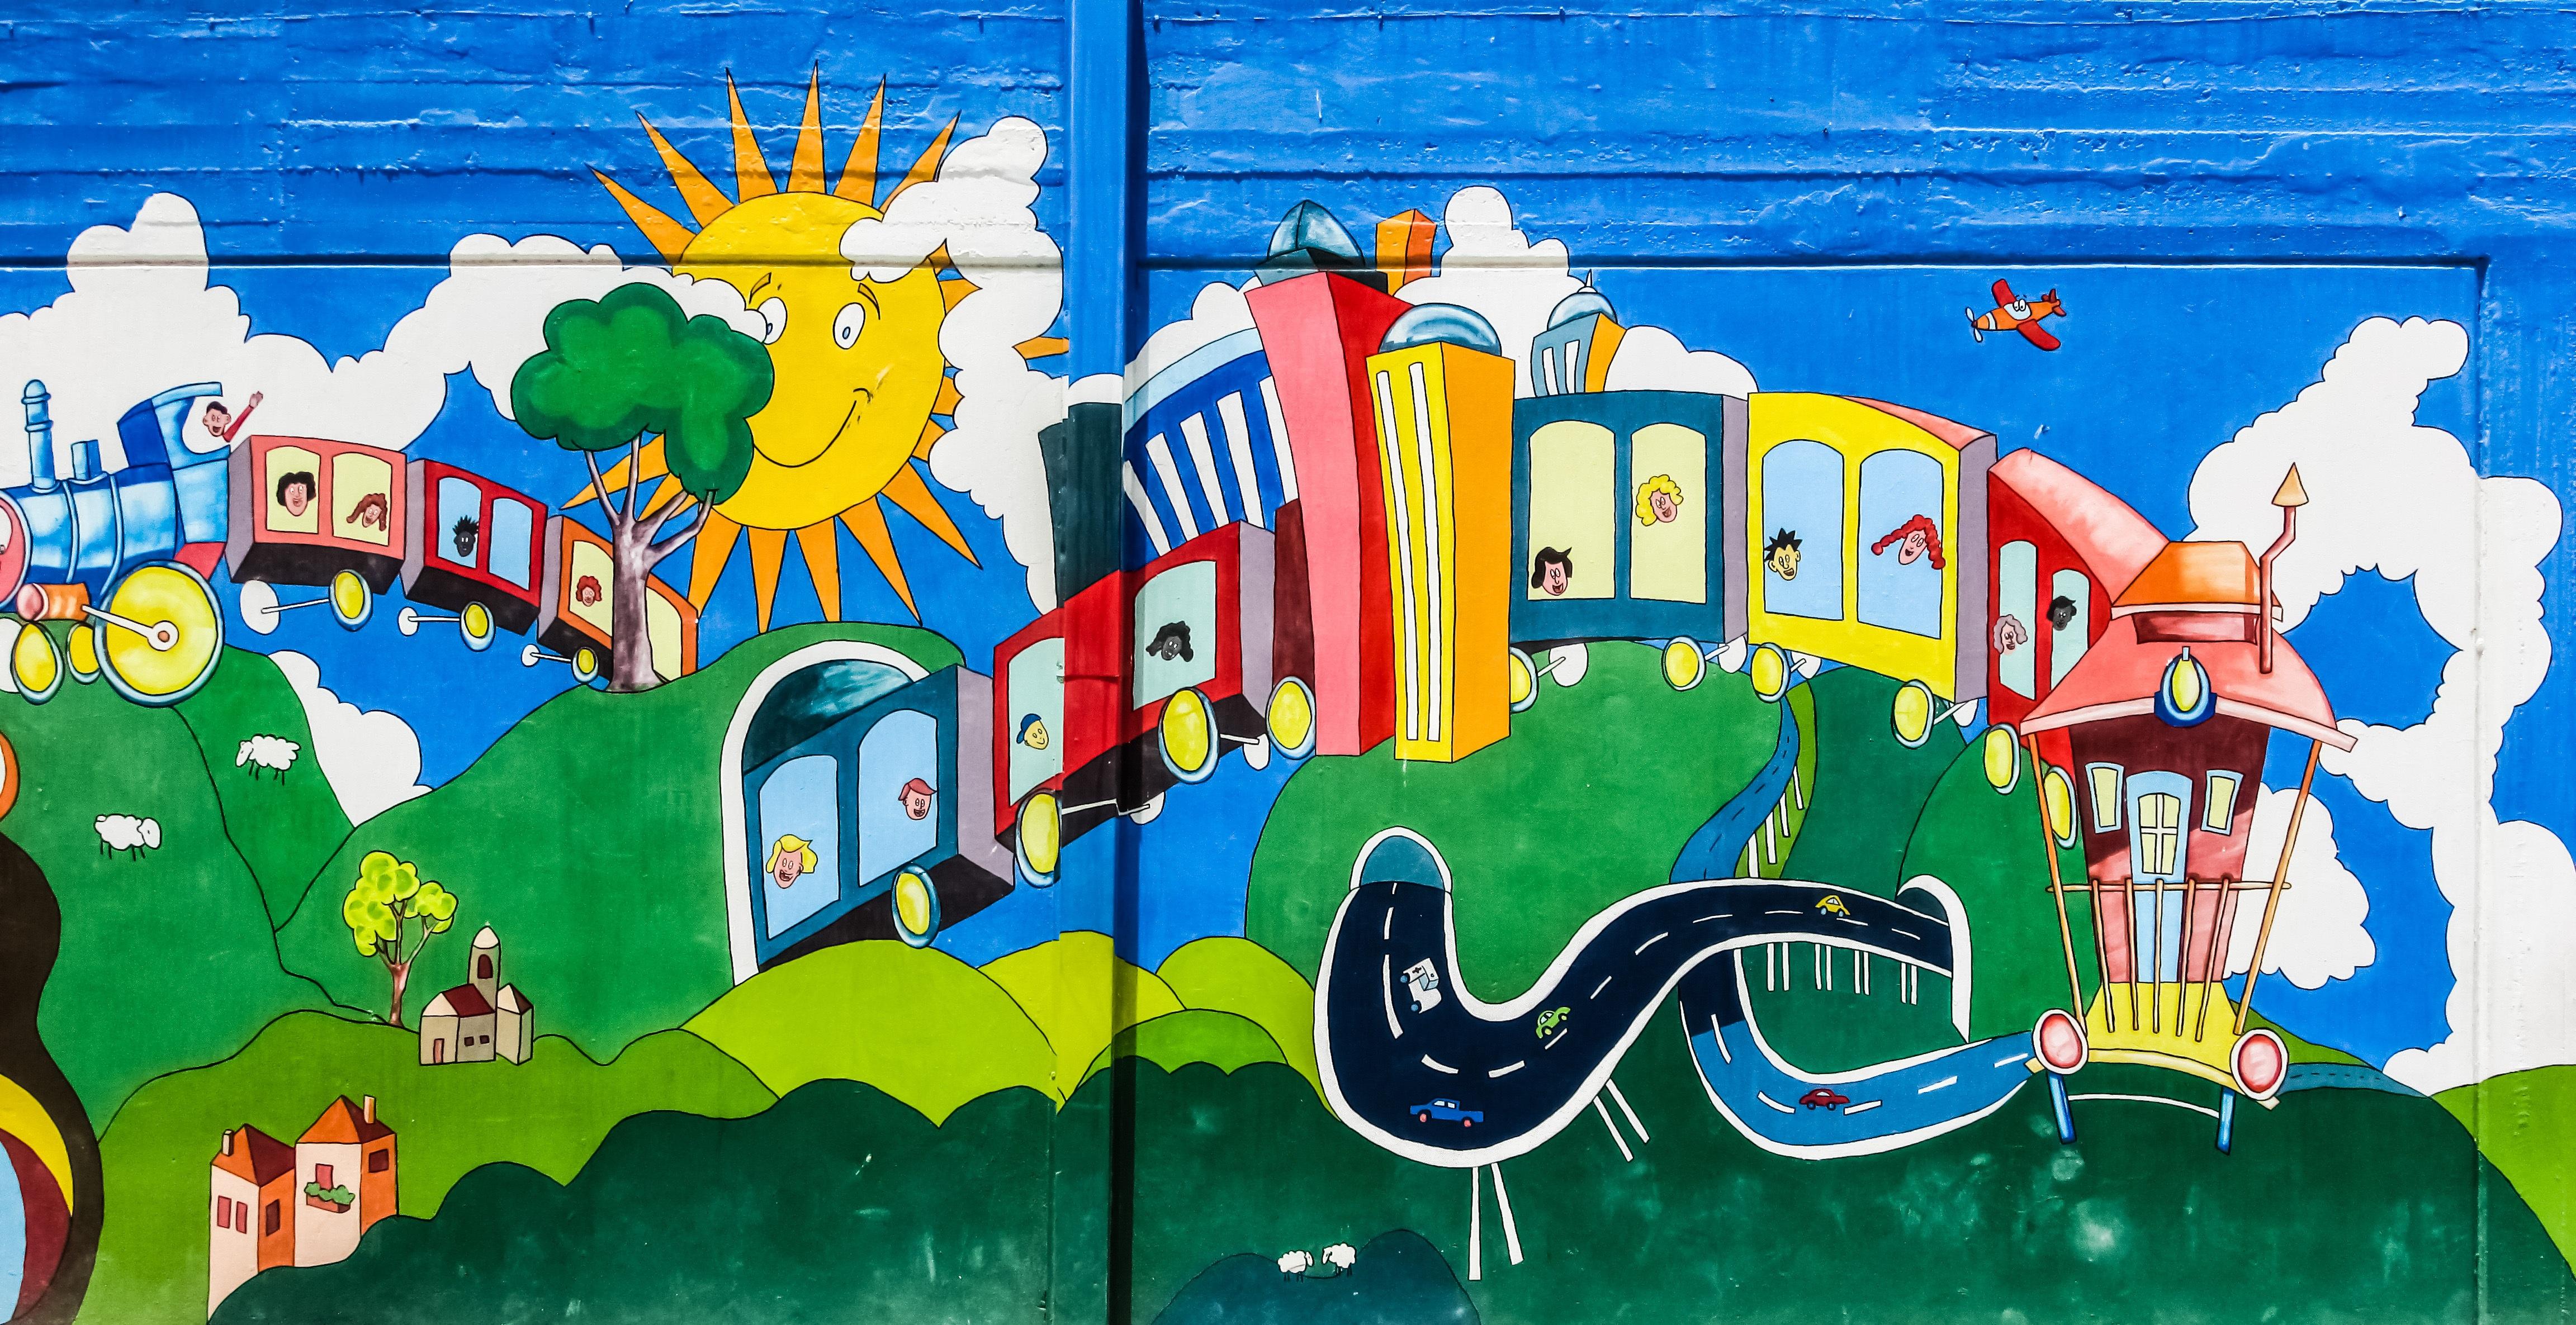 Gratis afbeeldingen muur kleurrijk graffiti kunst for Contoh lukisan mural tadika